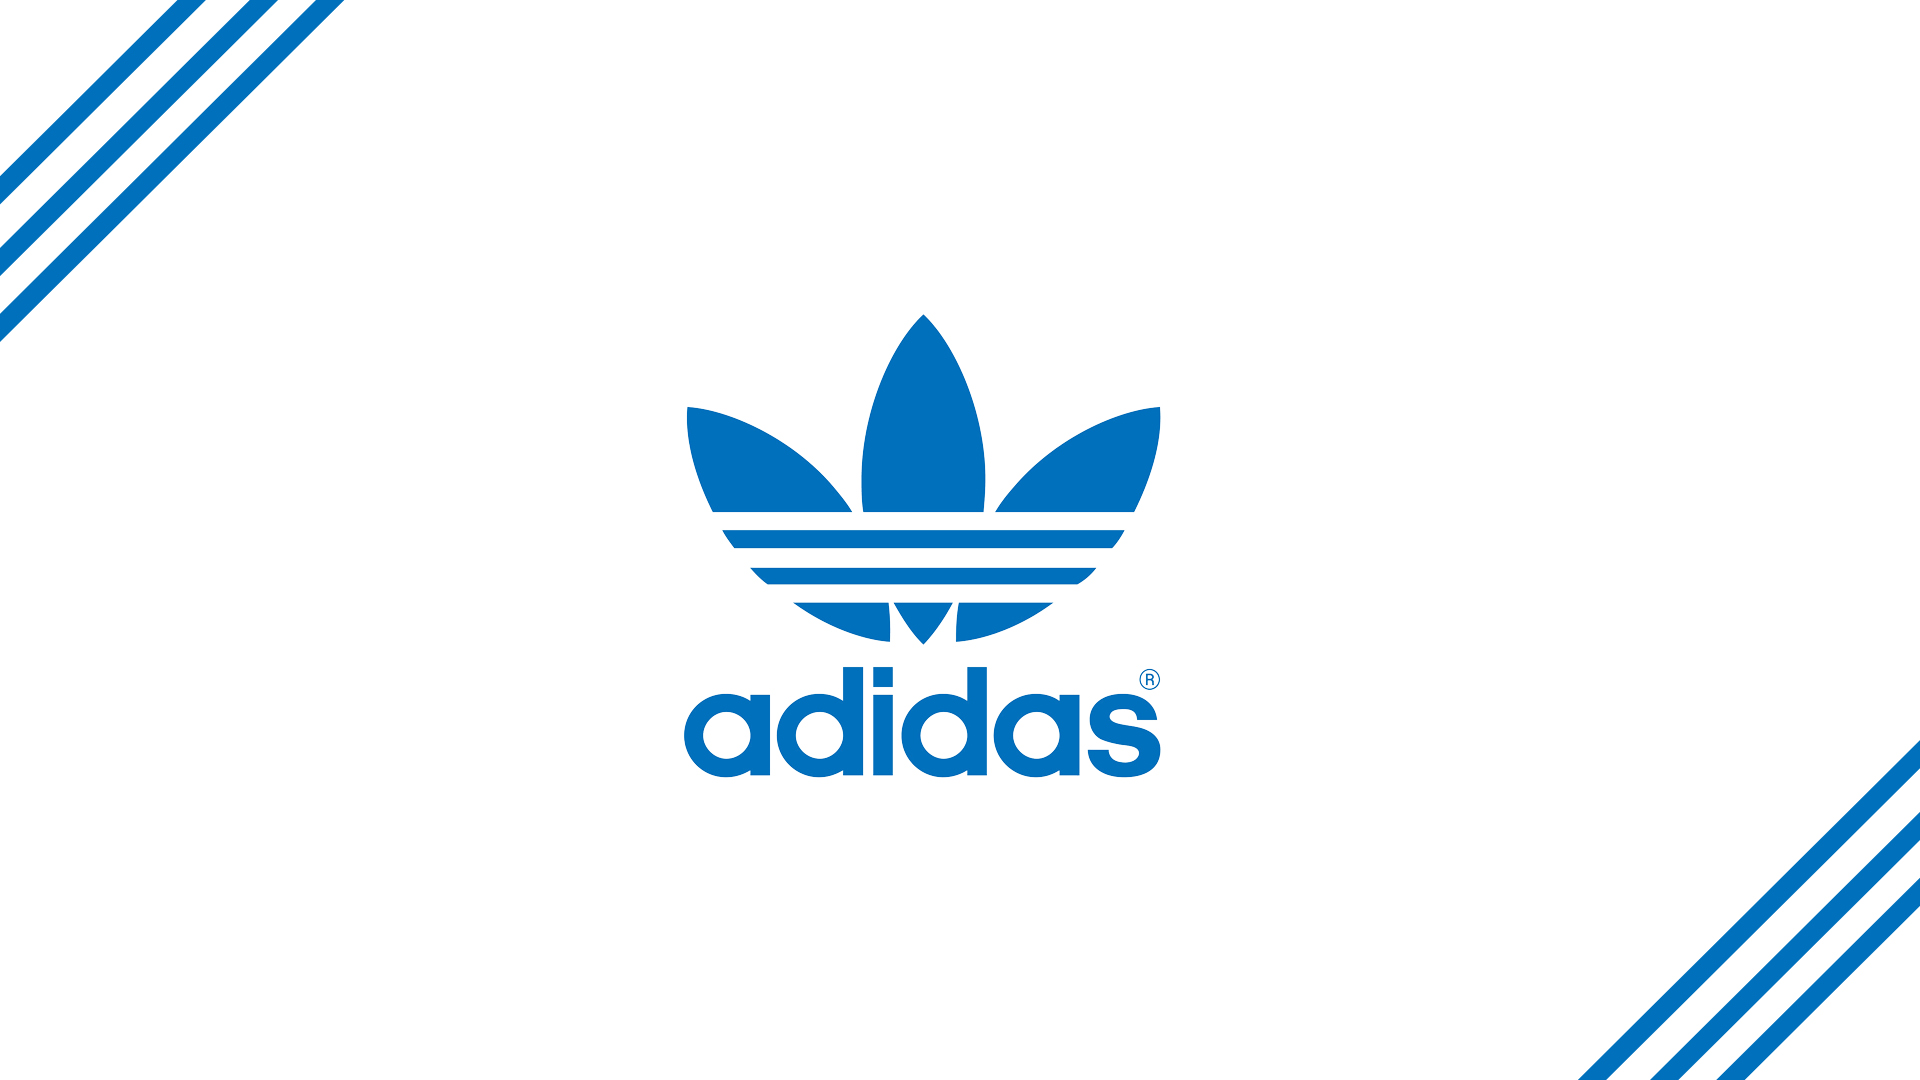 71 Adidas Originals Wallpaper On Wallpapersafari